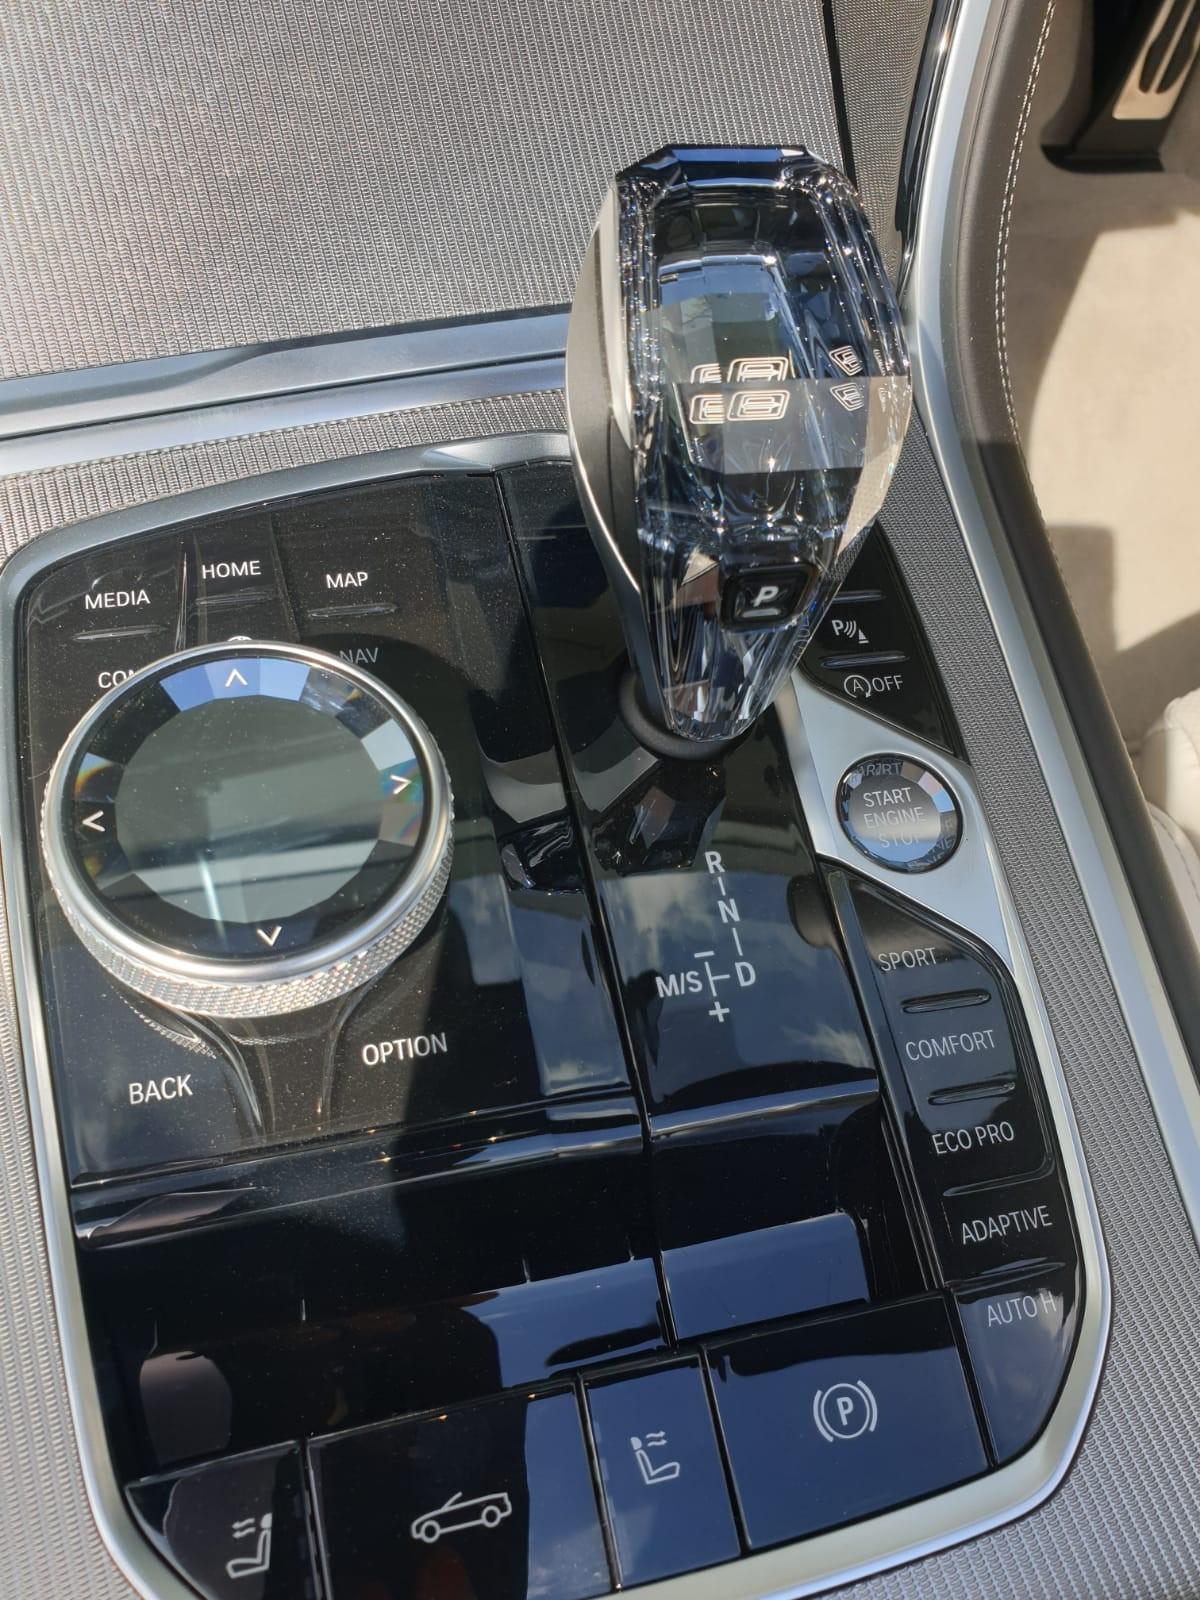 AS BMW gear